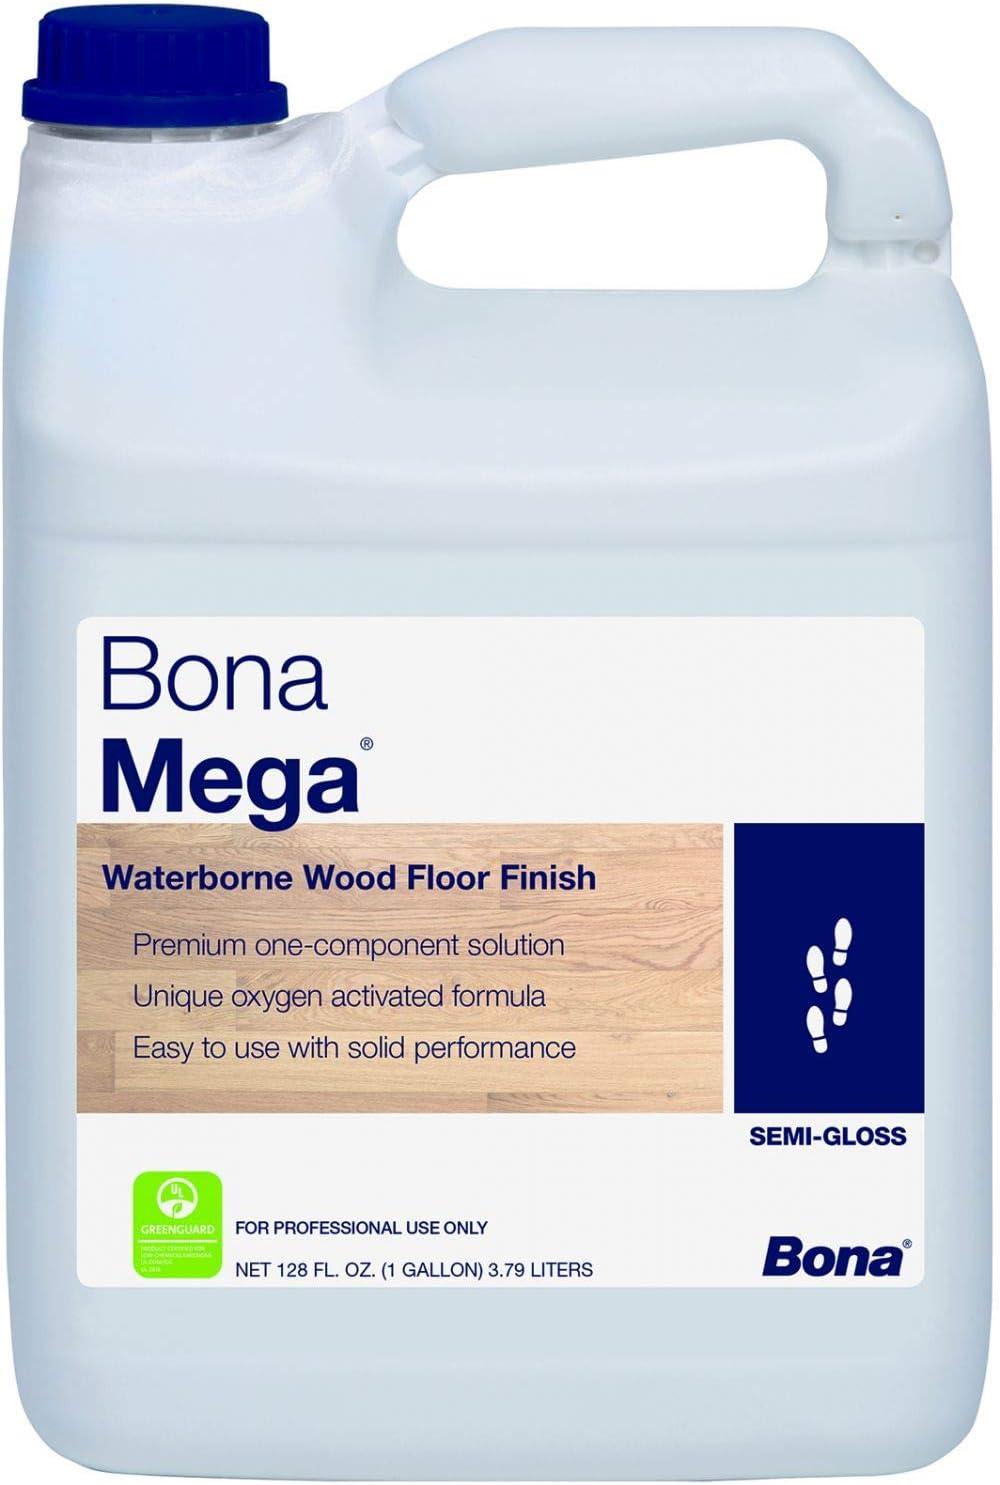 Bona Mega Semi-Gloss,1 gallon